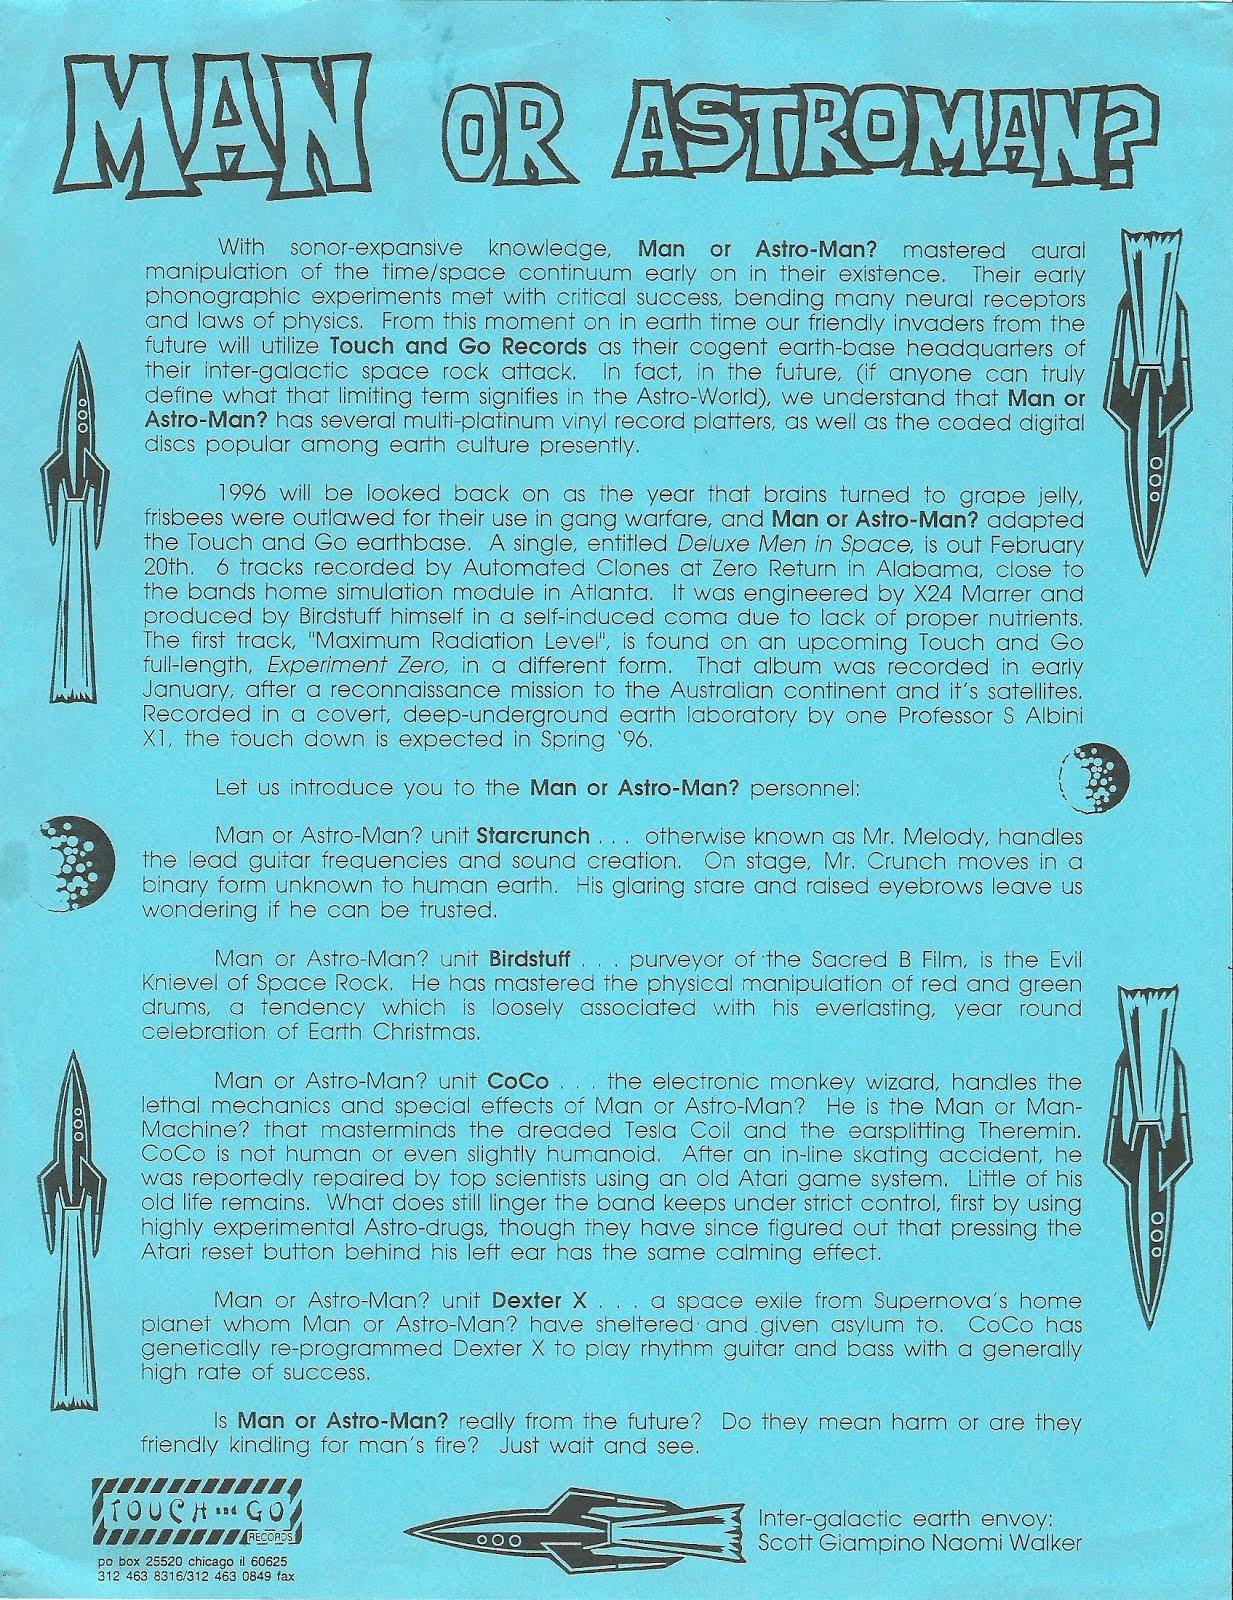 Astro Timeline Beta Test Tendencies Tshirt Legend Led Turquoise S 05 11 1996